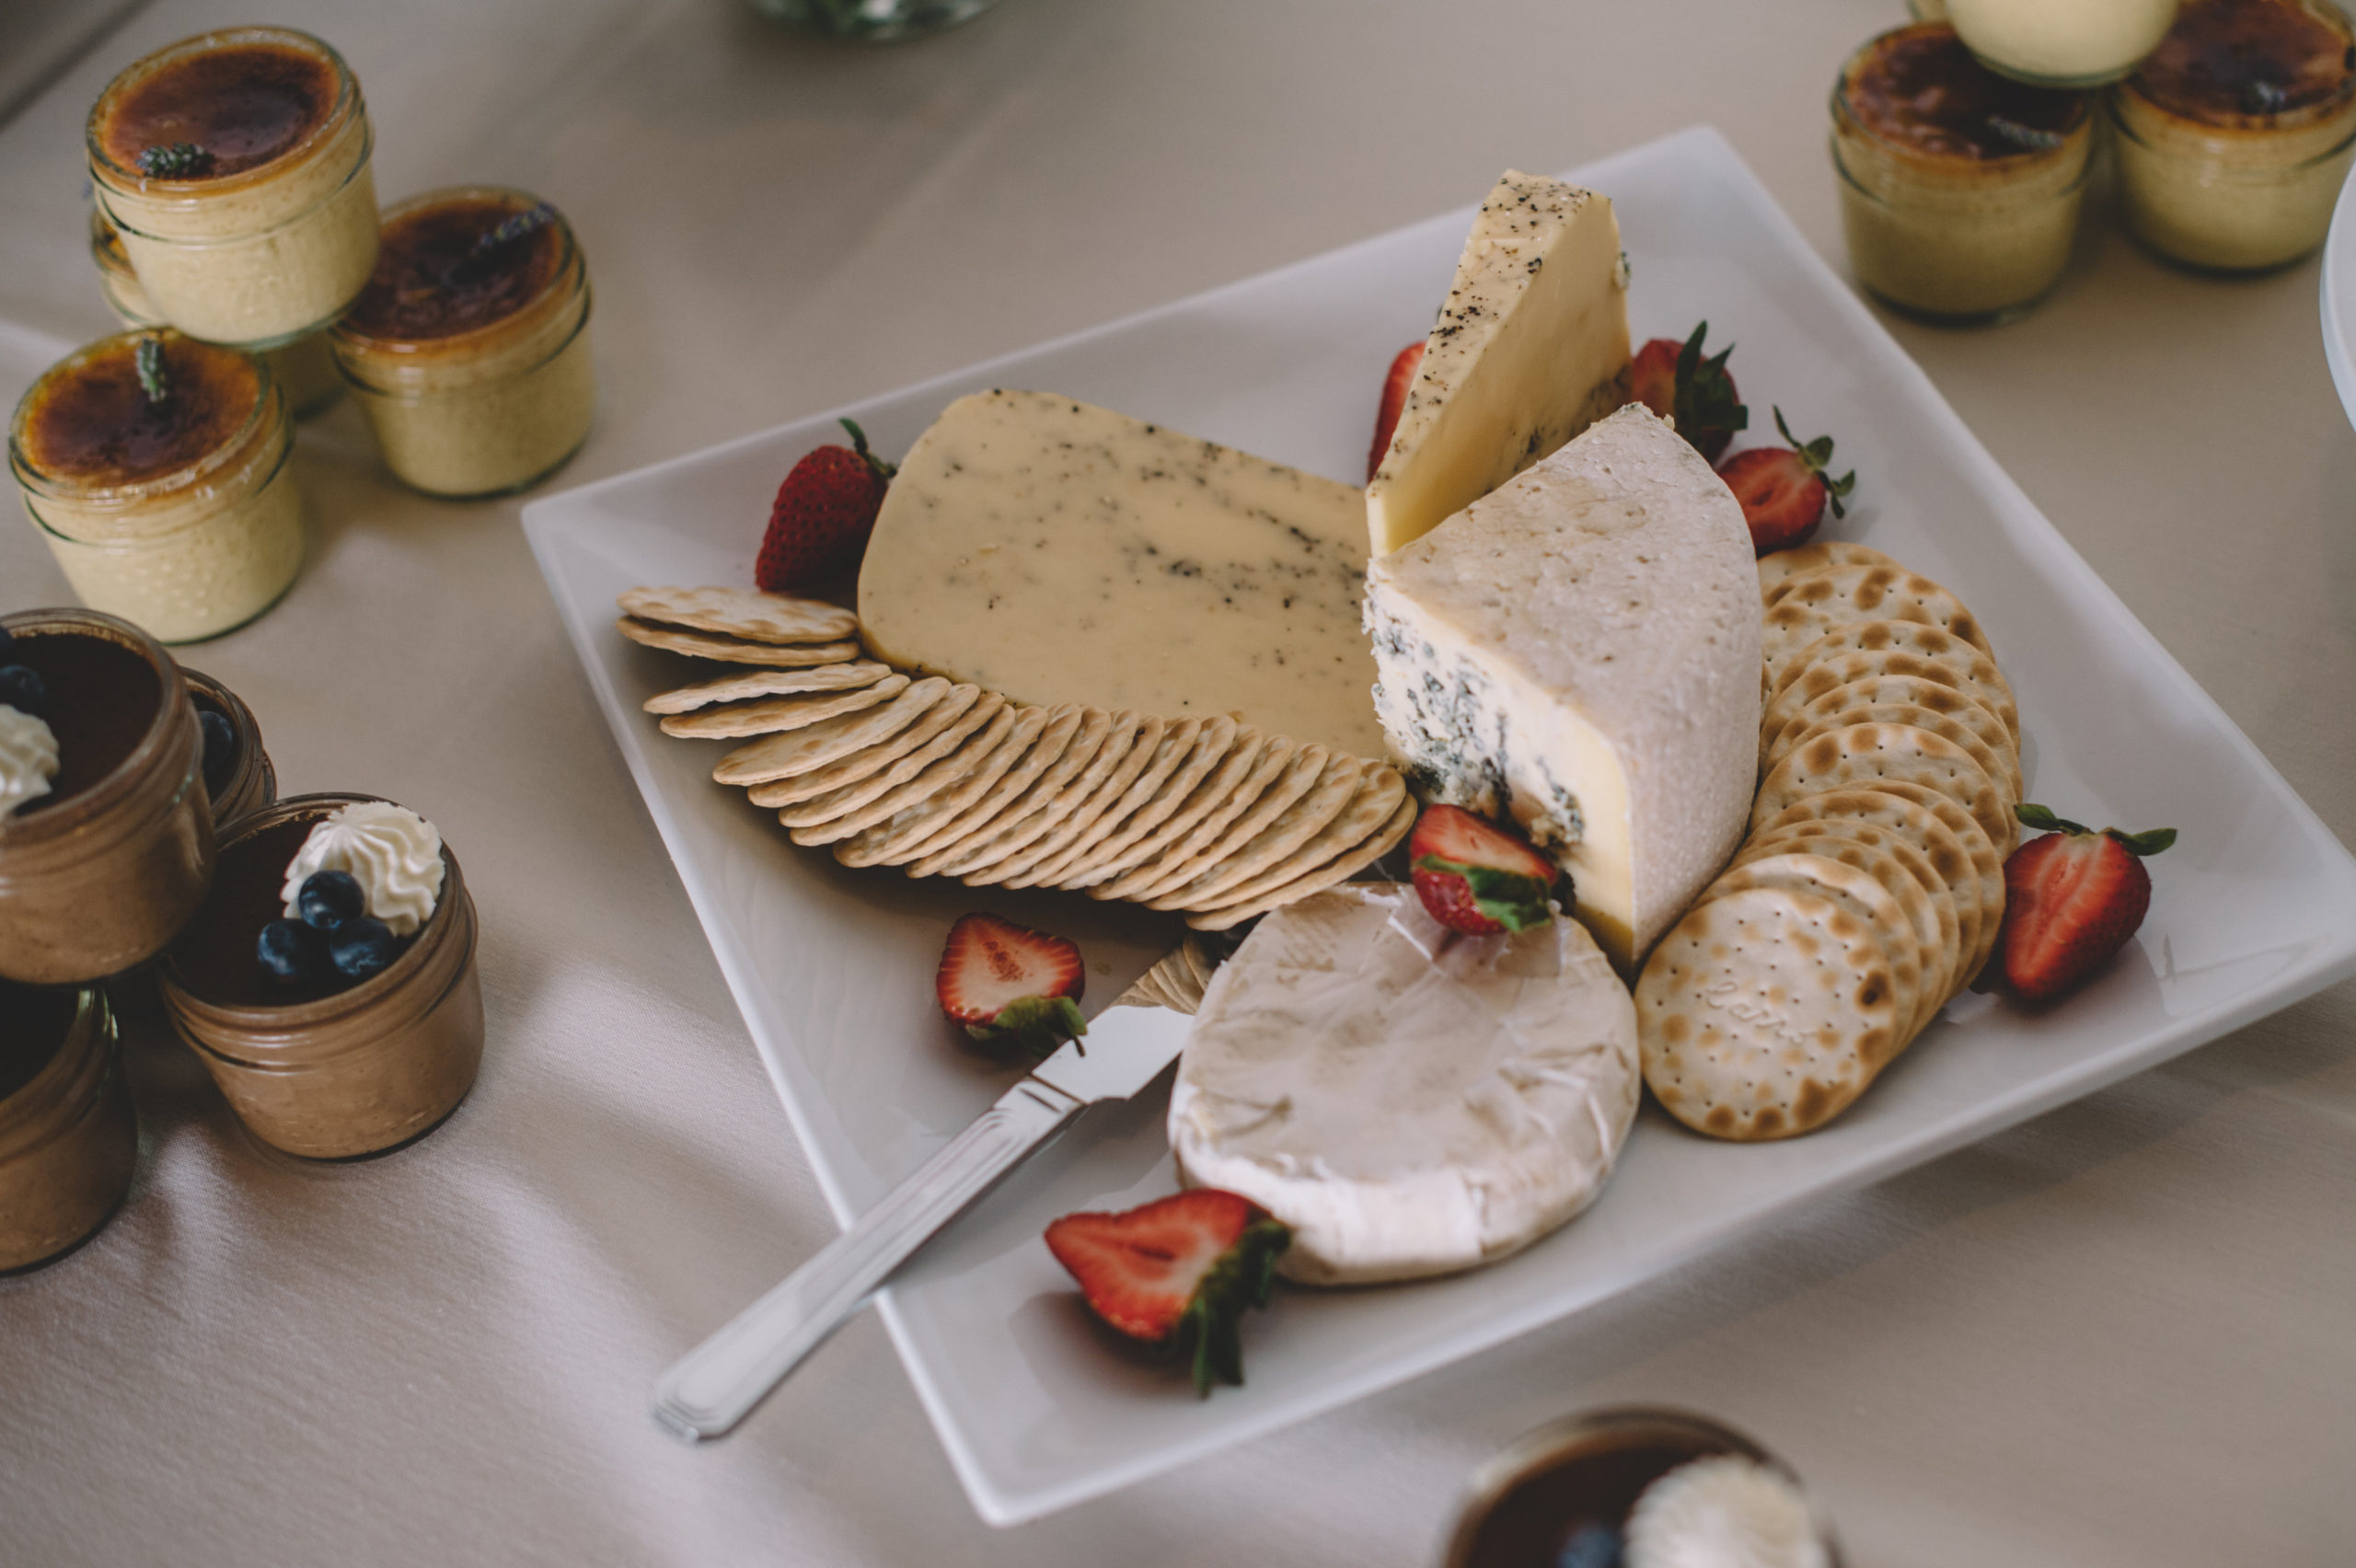 Szymon Szymczakowski_Crackers and Cheese Wedding Feast